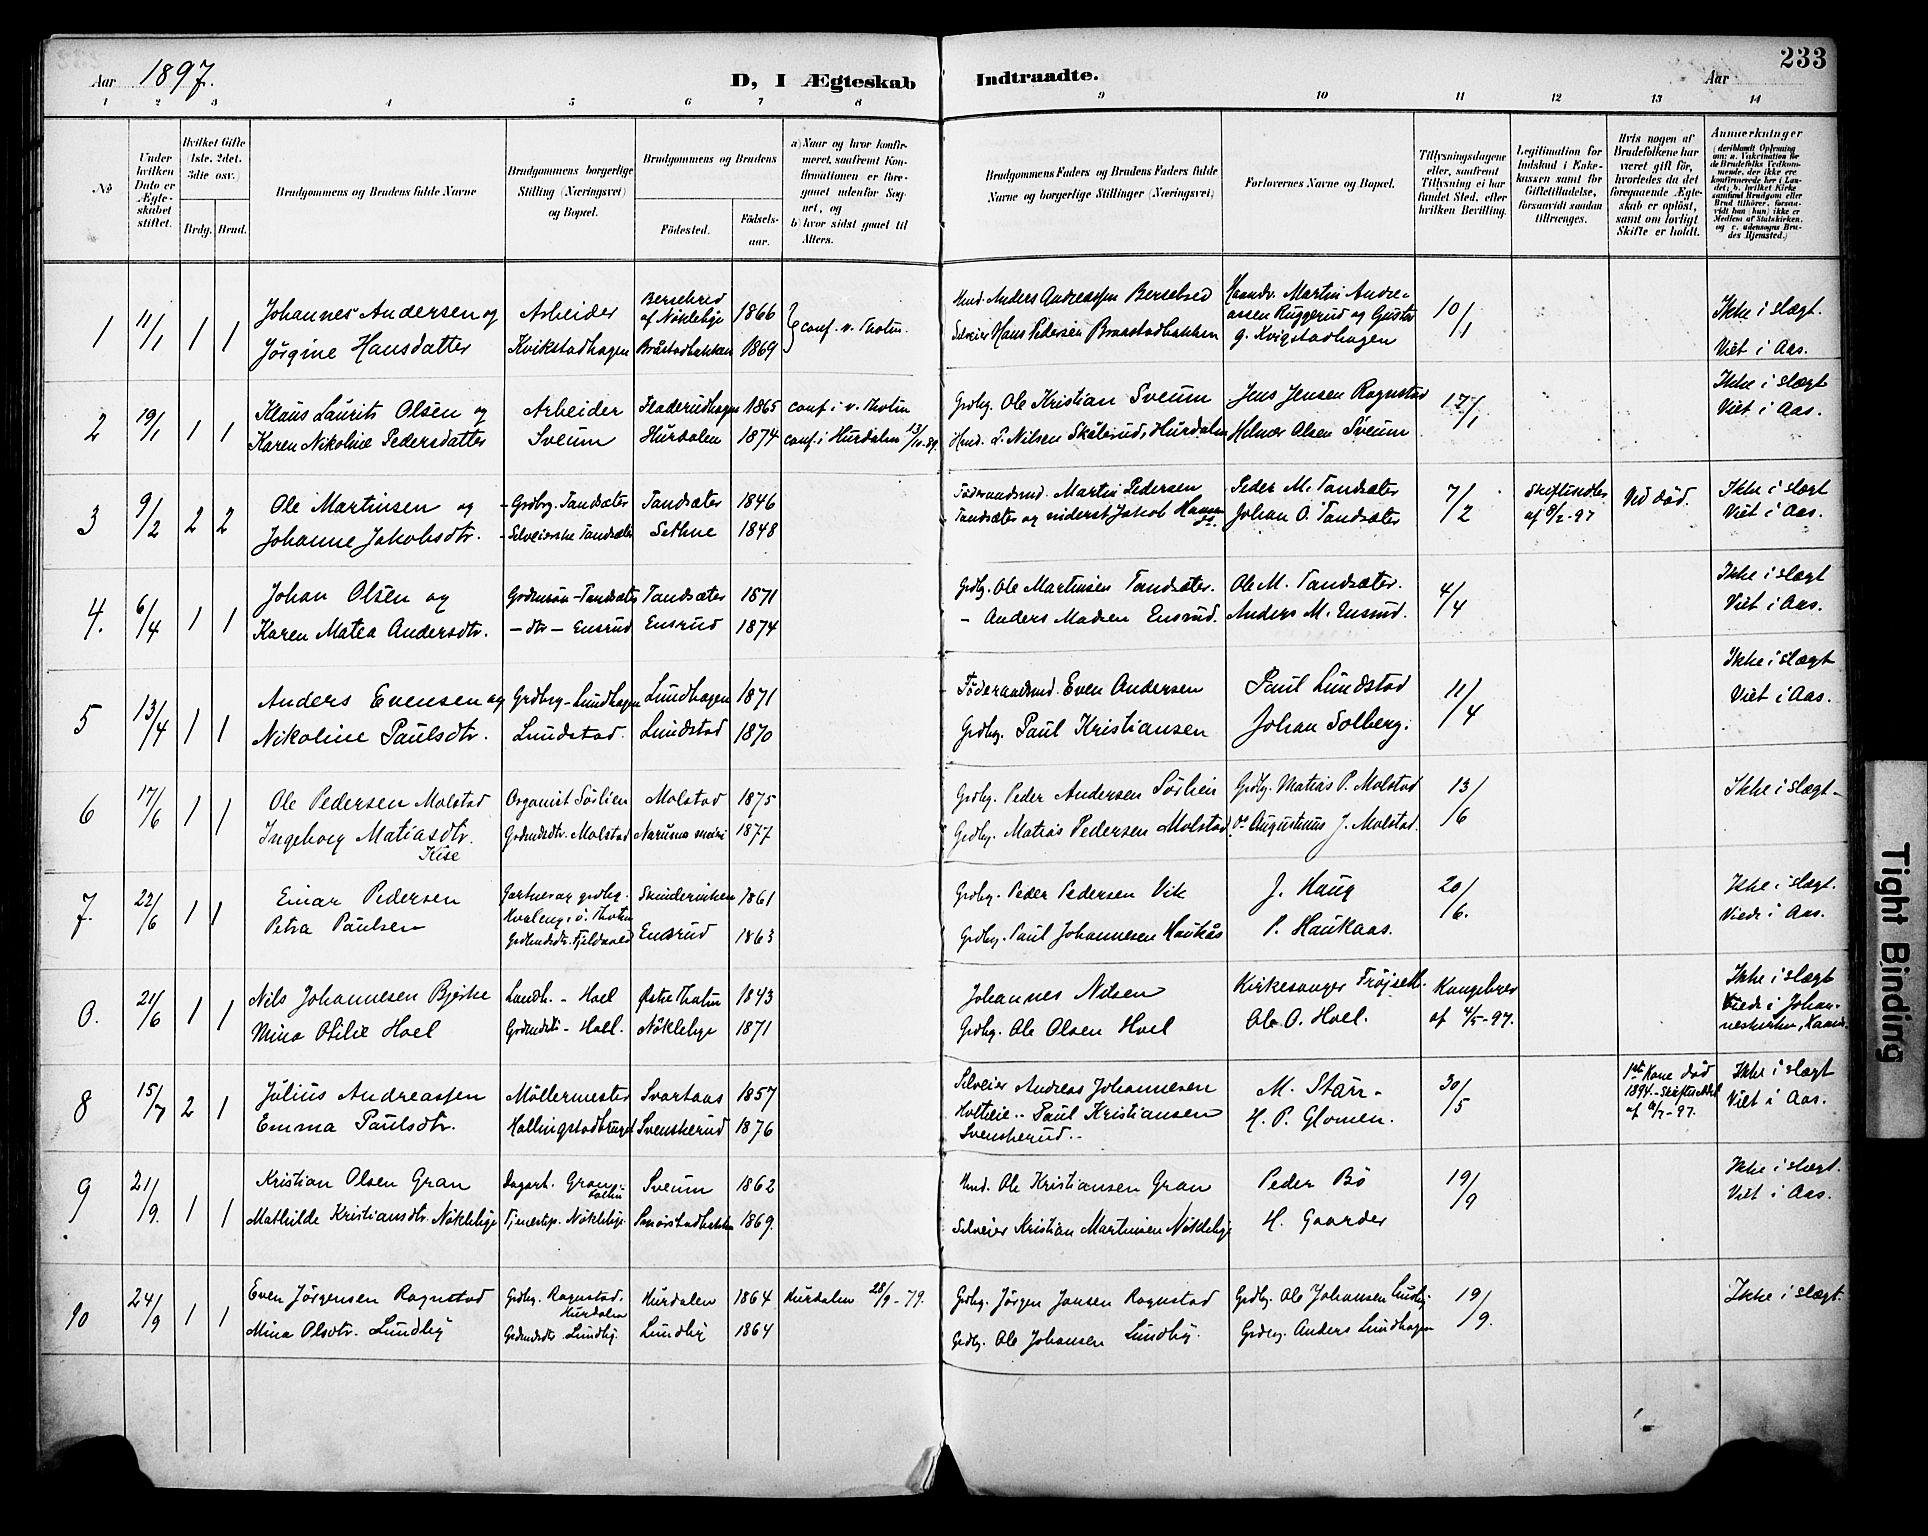 SAH, Vestre Toten prestekontor, H/Ha/Haa/L0013: Ministerialbok nr. 13, 1895-1911, s. 233